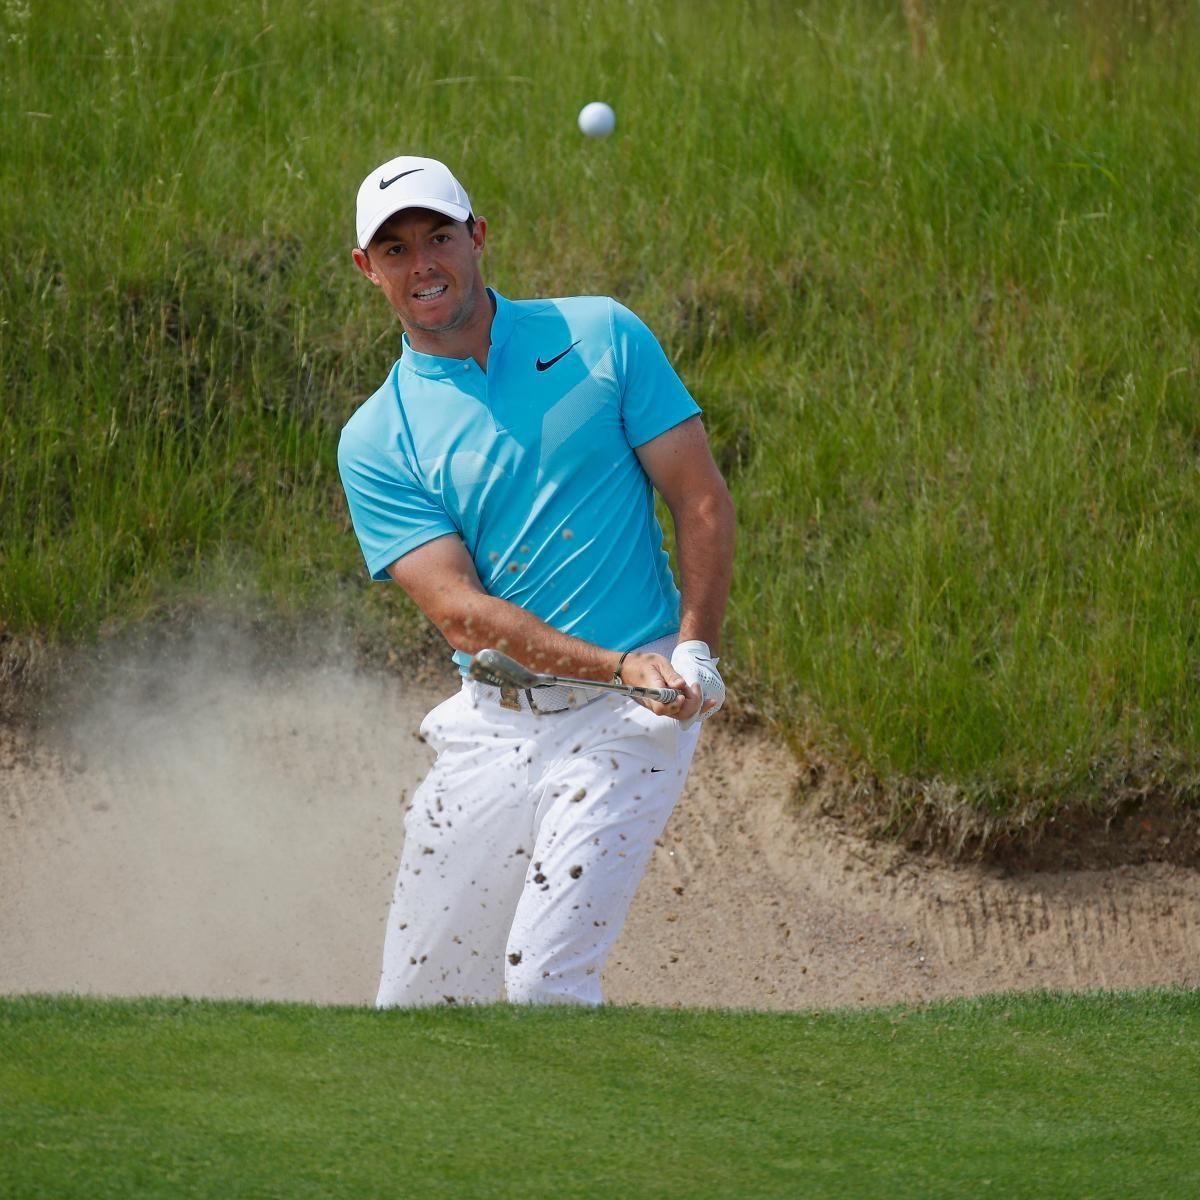 33++ Bbc sport golf us pga leaderboard information